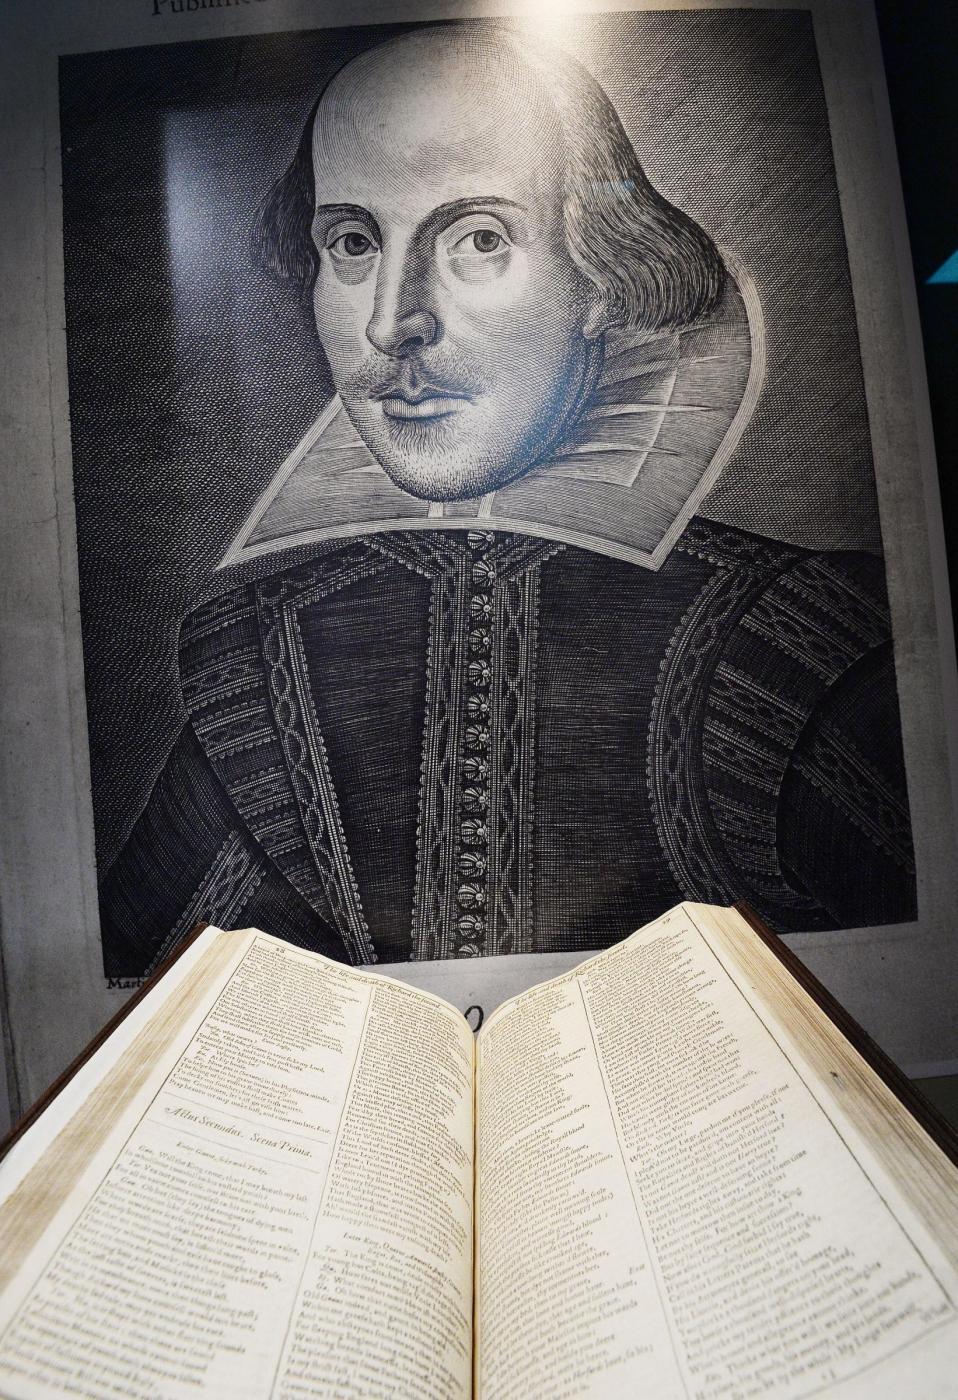 william shakespeare, drammaturgo inglese